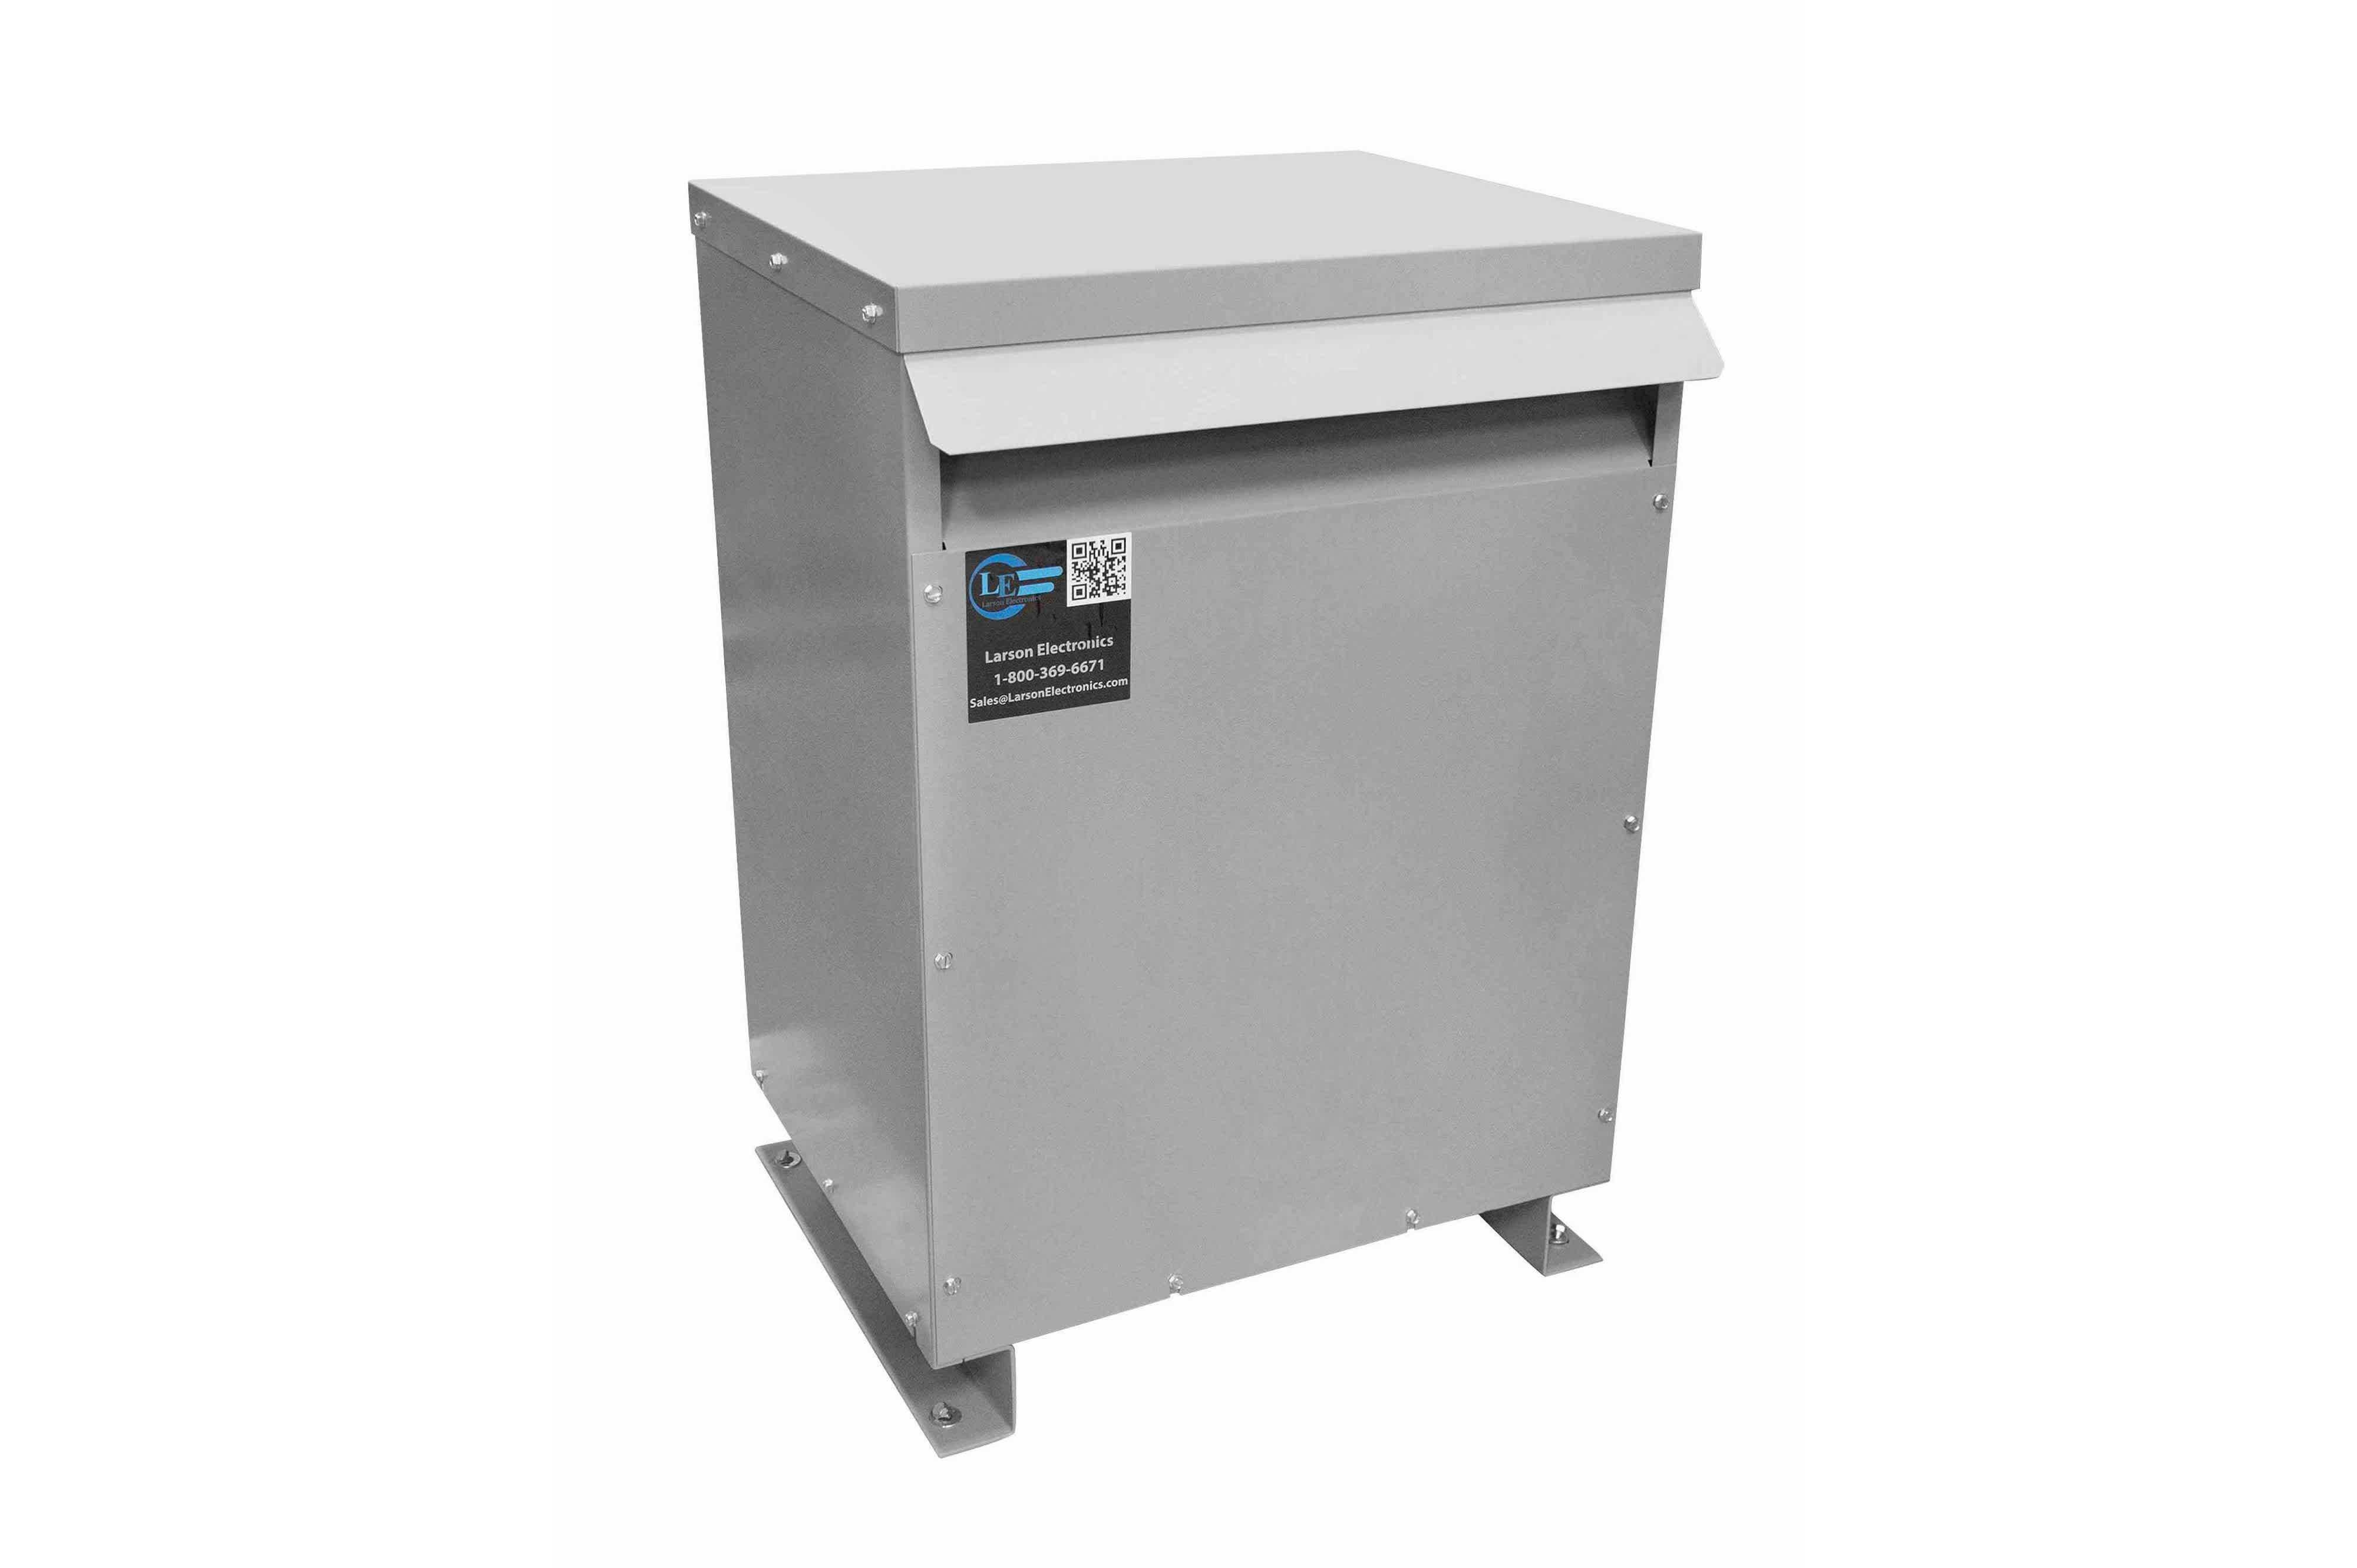 600 kVA 3PH Isolation Transformer, 220V Wye Primary, 480Y/277 Wye-N Secondary, N3R, Ventilated, 60 Hz